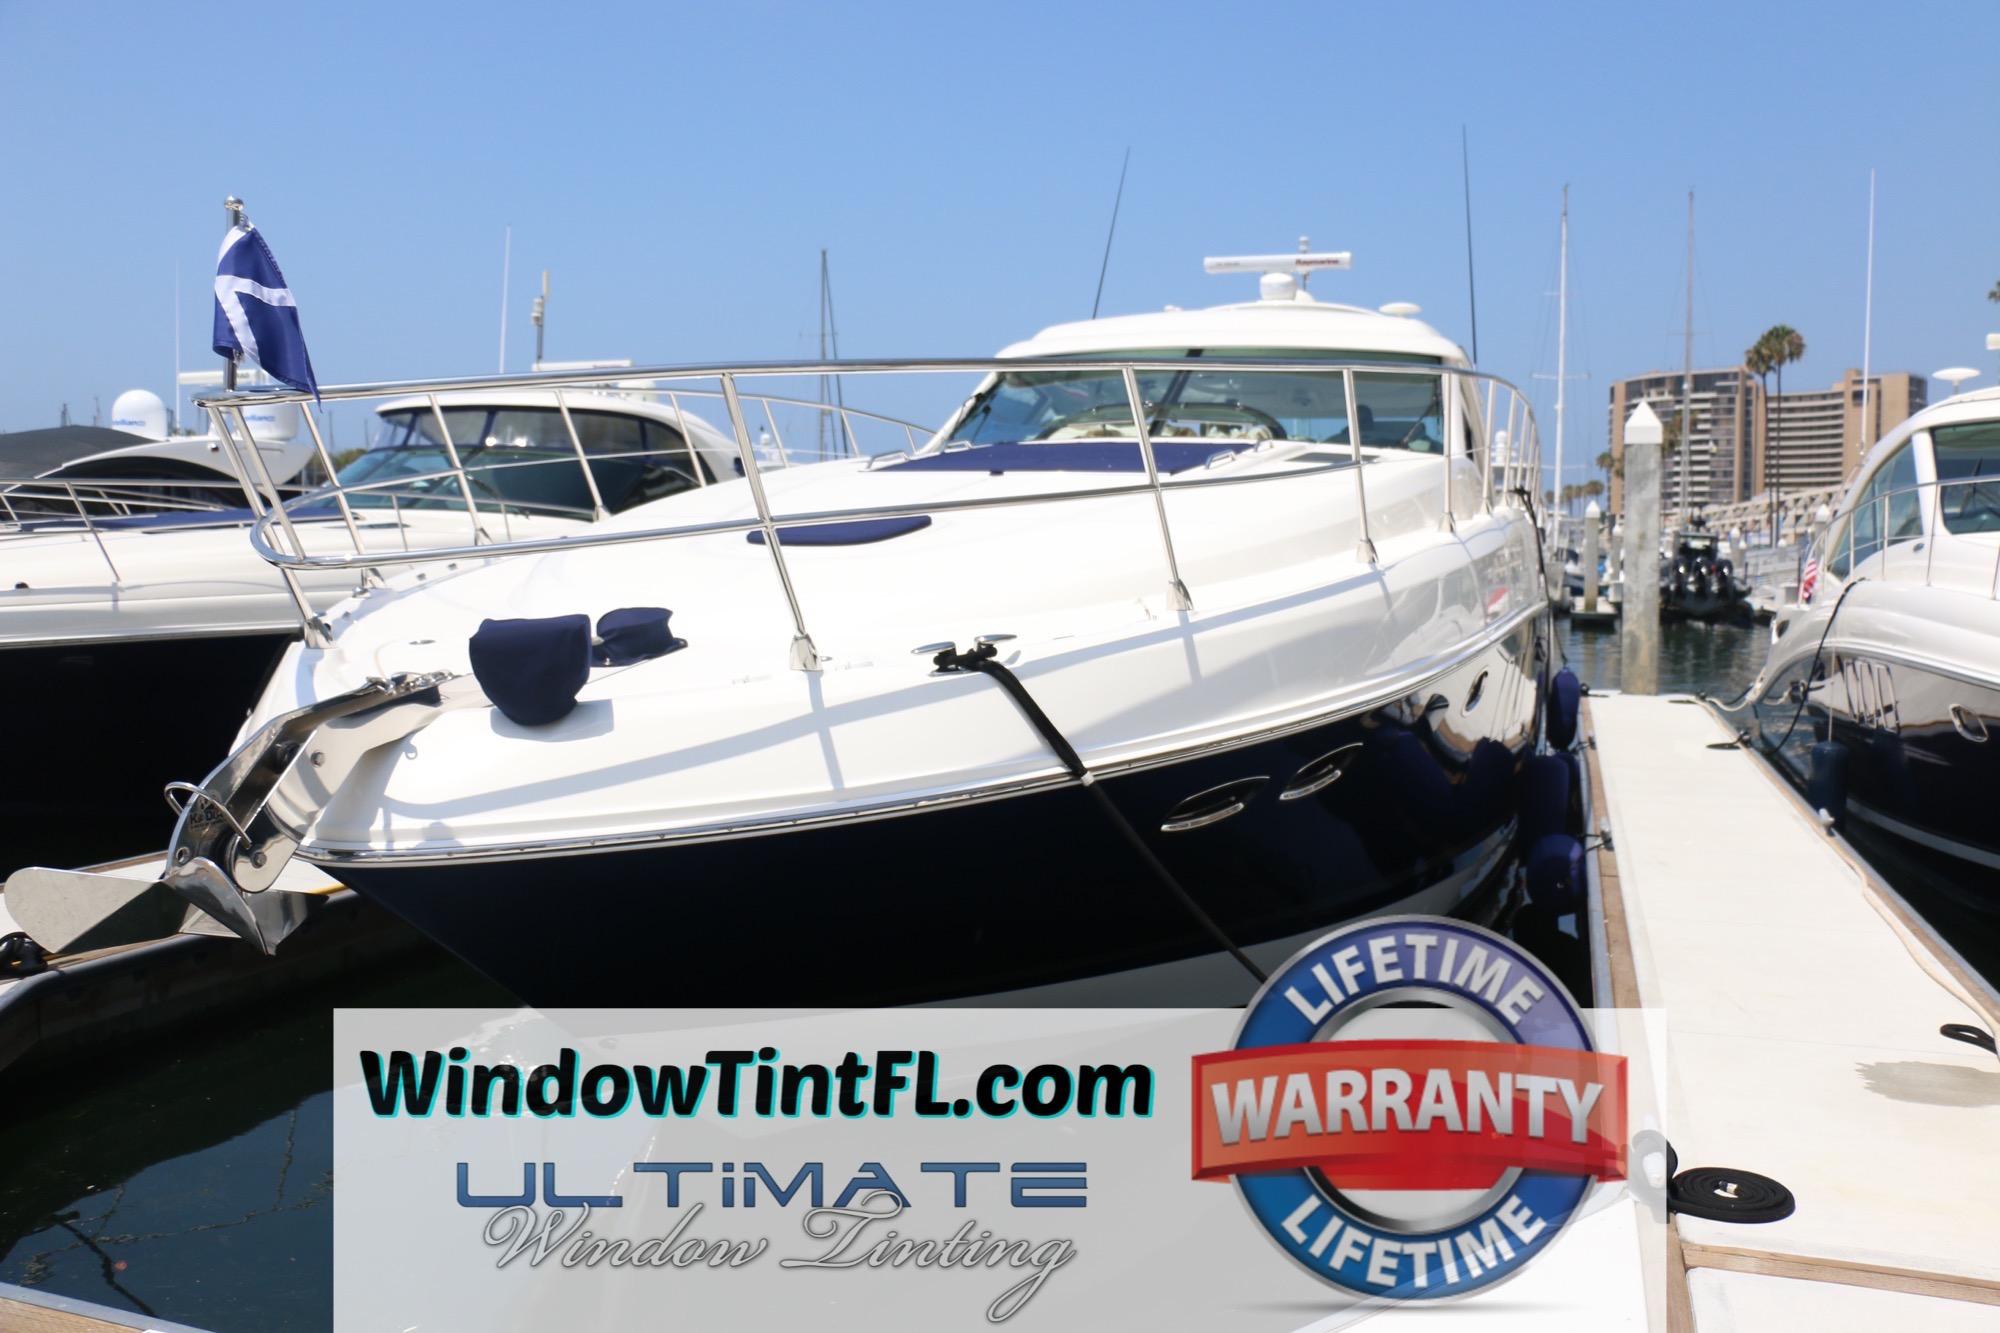 Marine Solar Window Film - Boat Window Tinting in Sarasota Florida - The Yacht Window Tinting Specialists! Ultimate Window Tinting